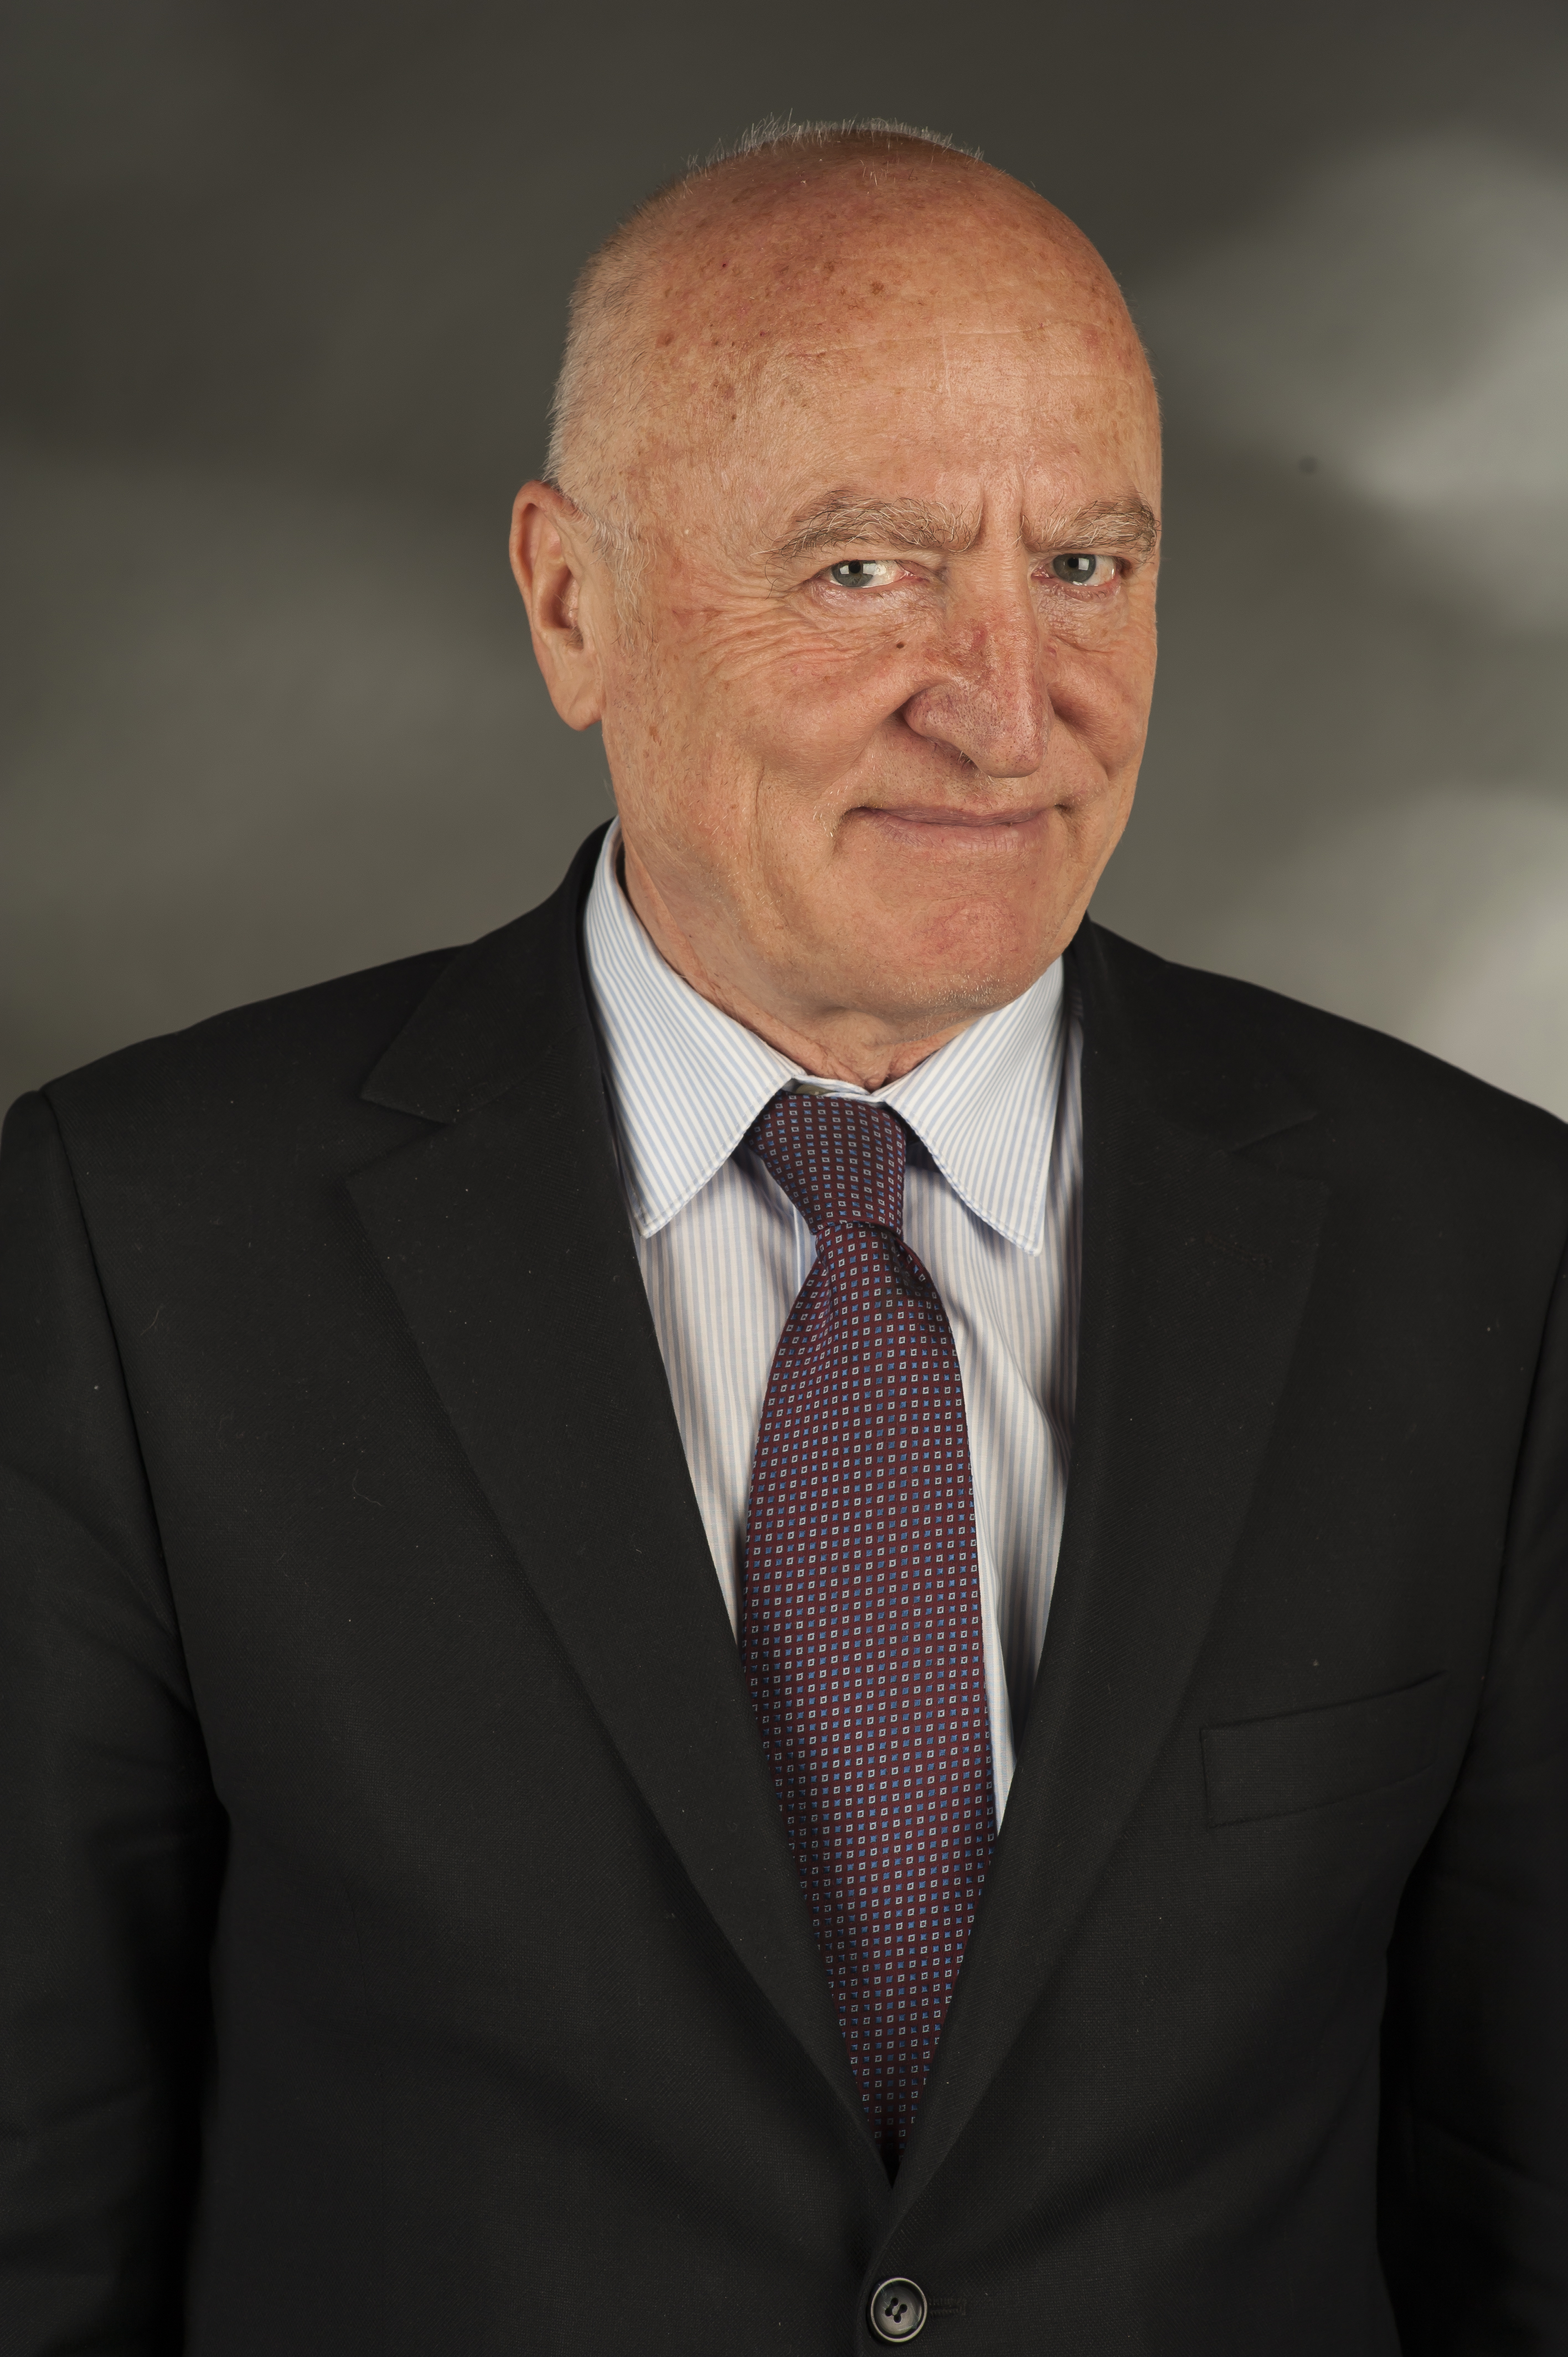 Josef Weidenholzer